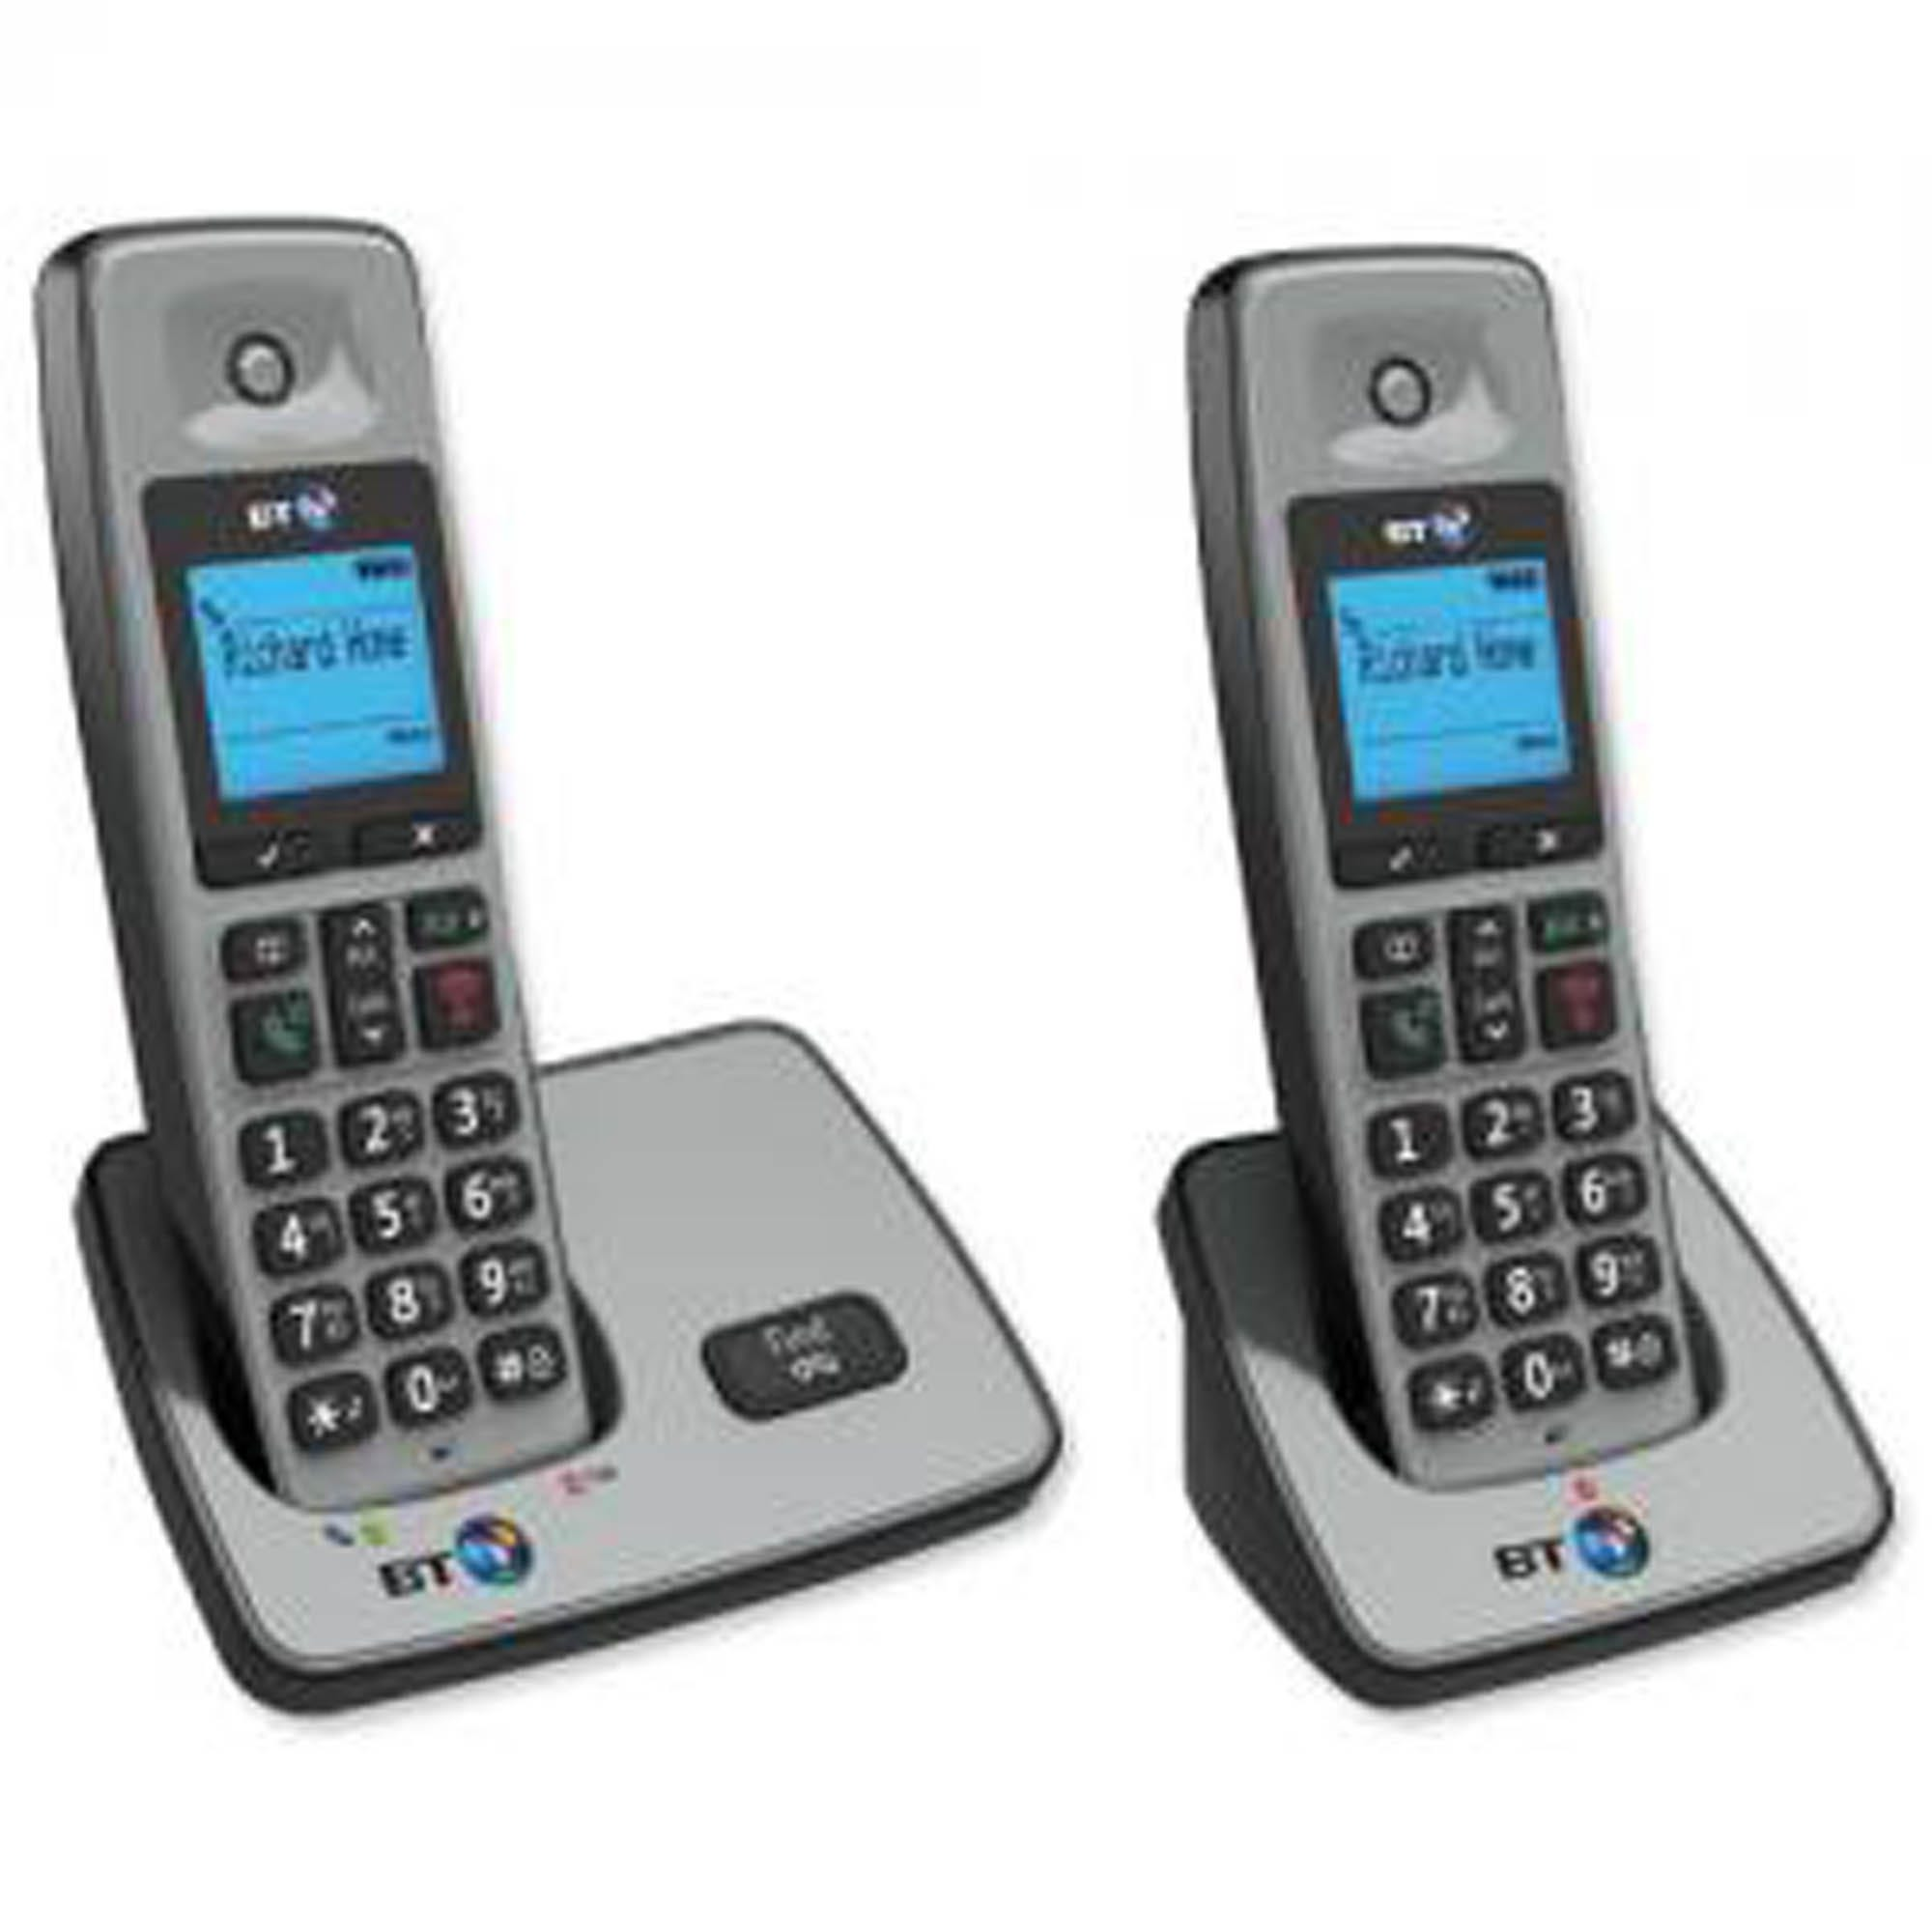 BT2000 Cordless Telephone - Twin